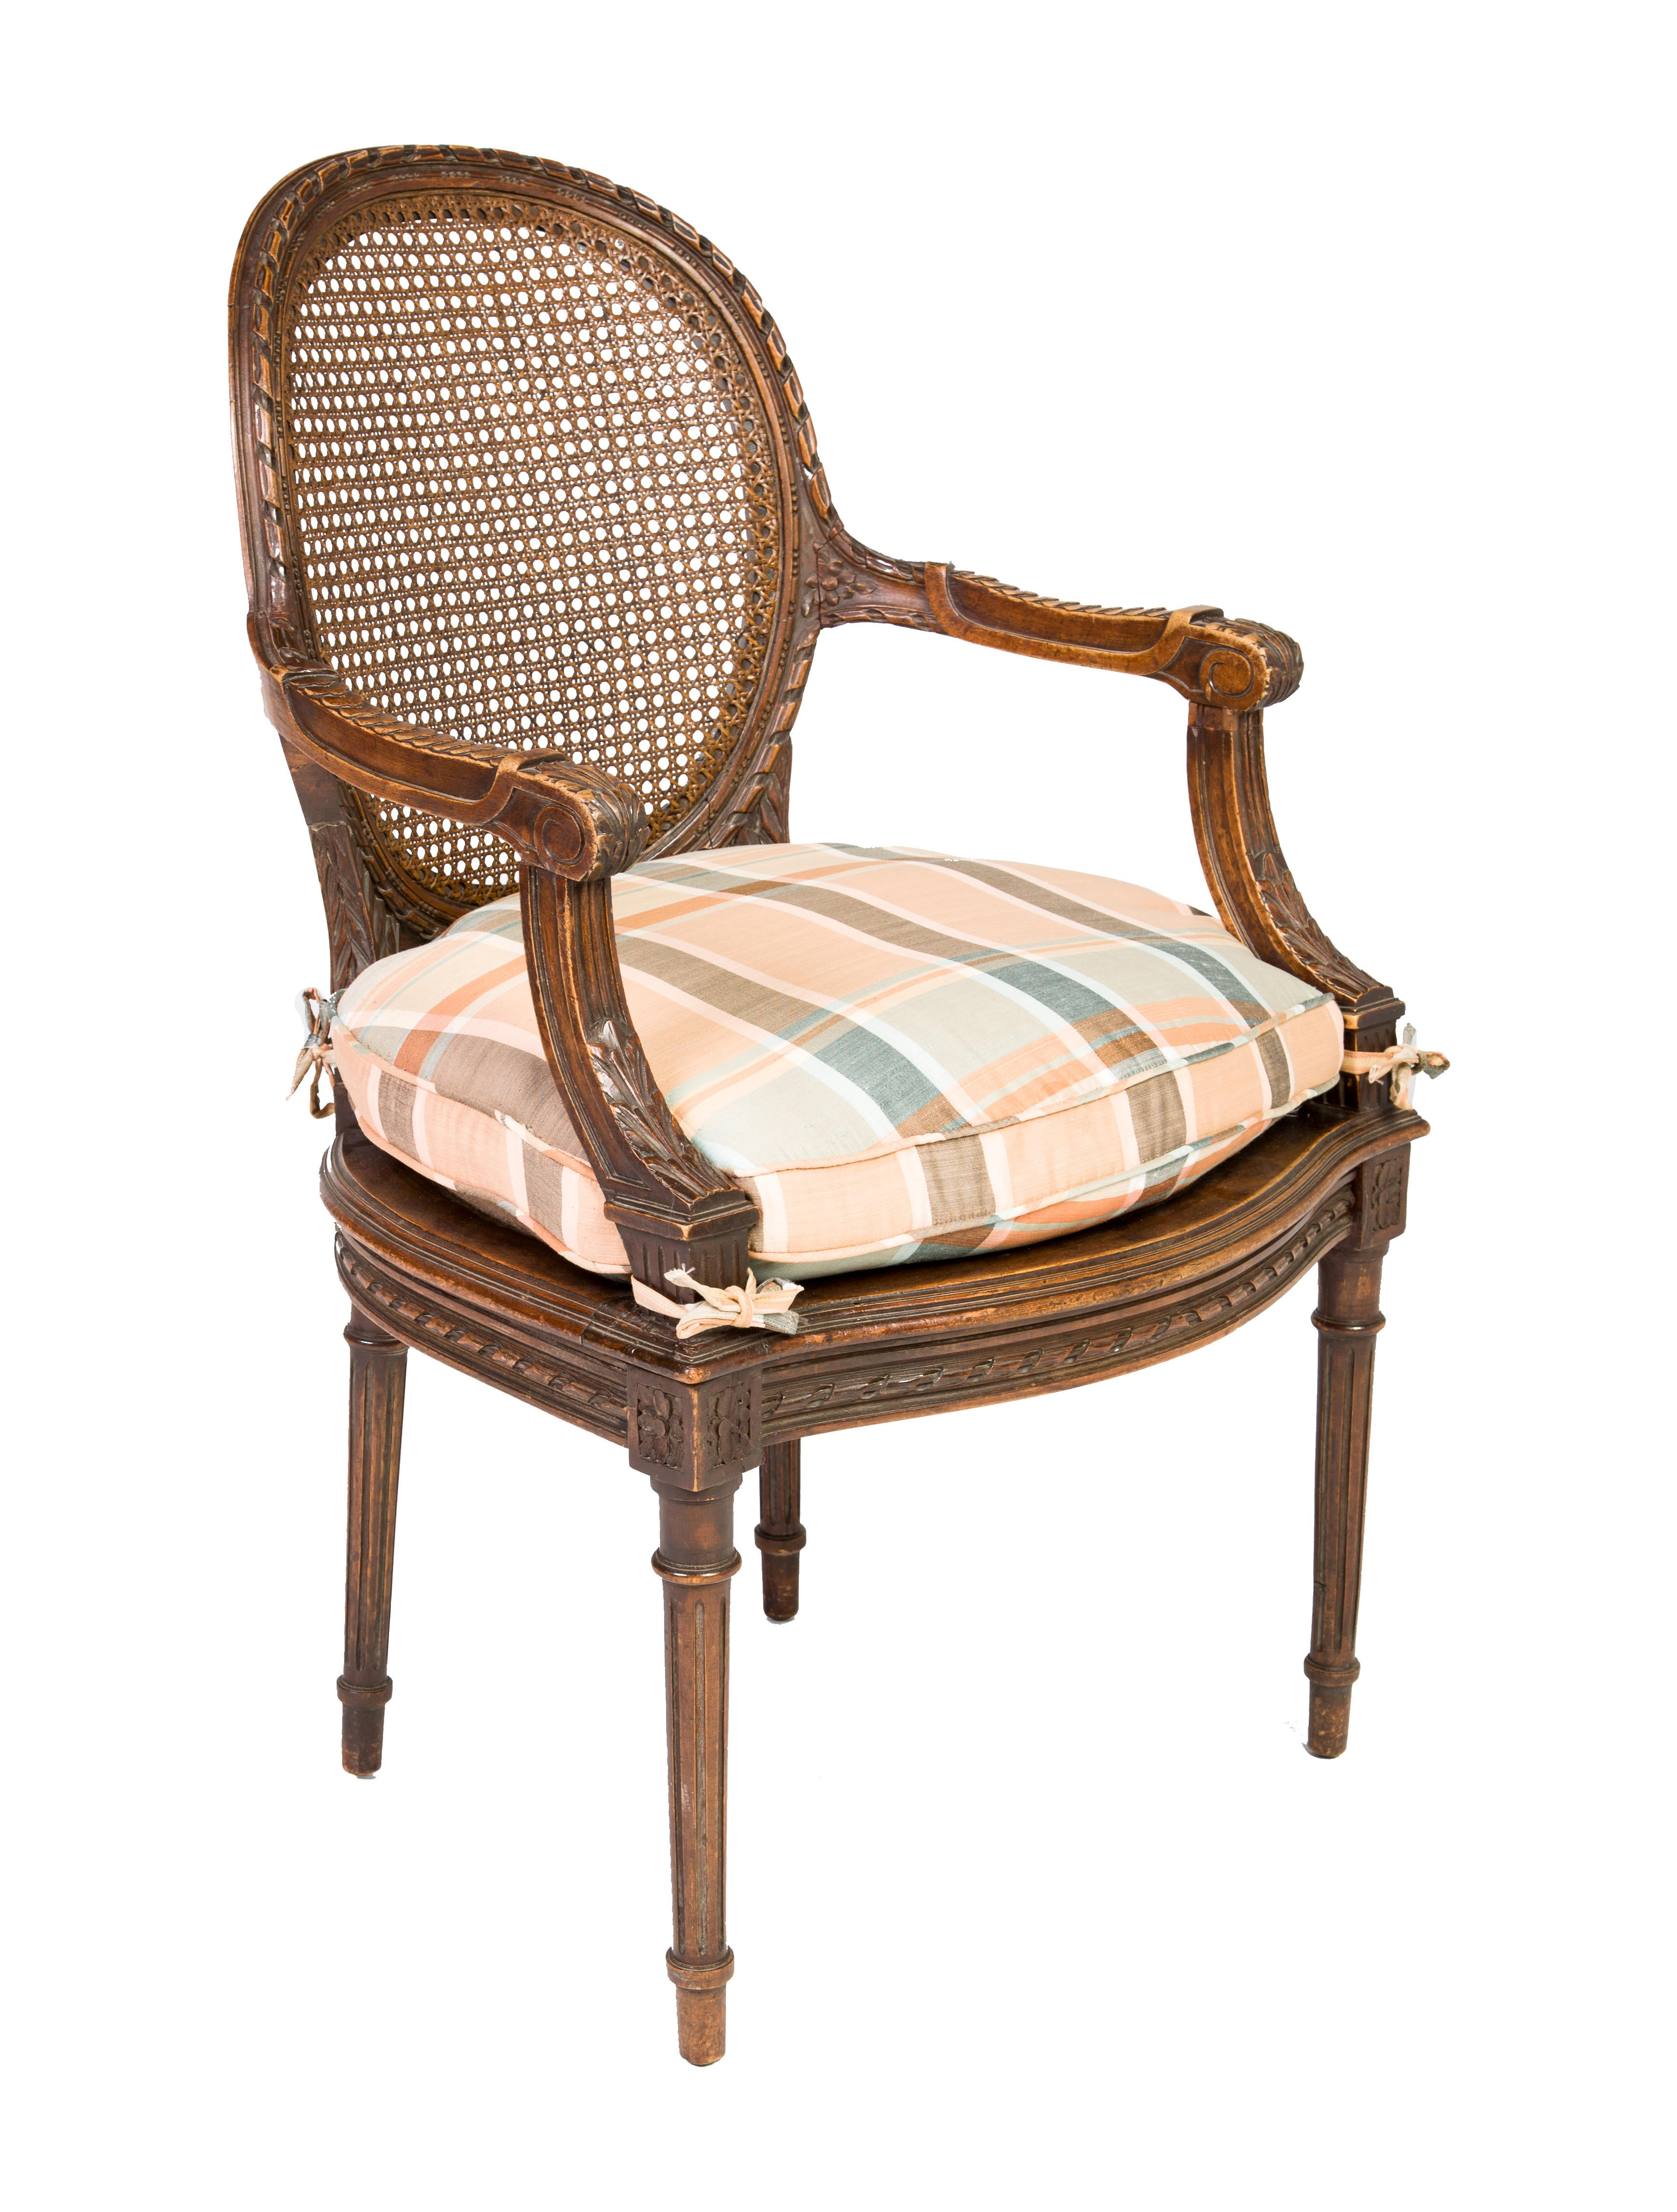 Louis Xvi Style Armchair Furniture Chair20466 The